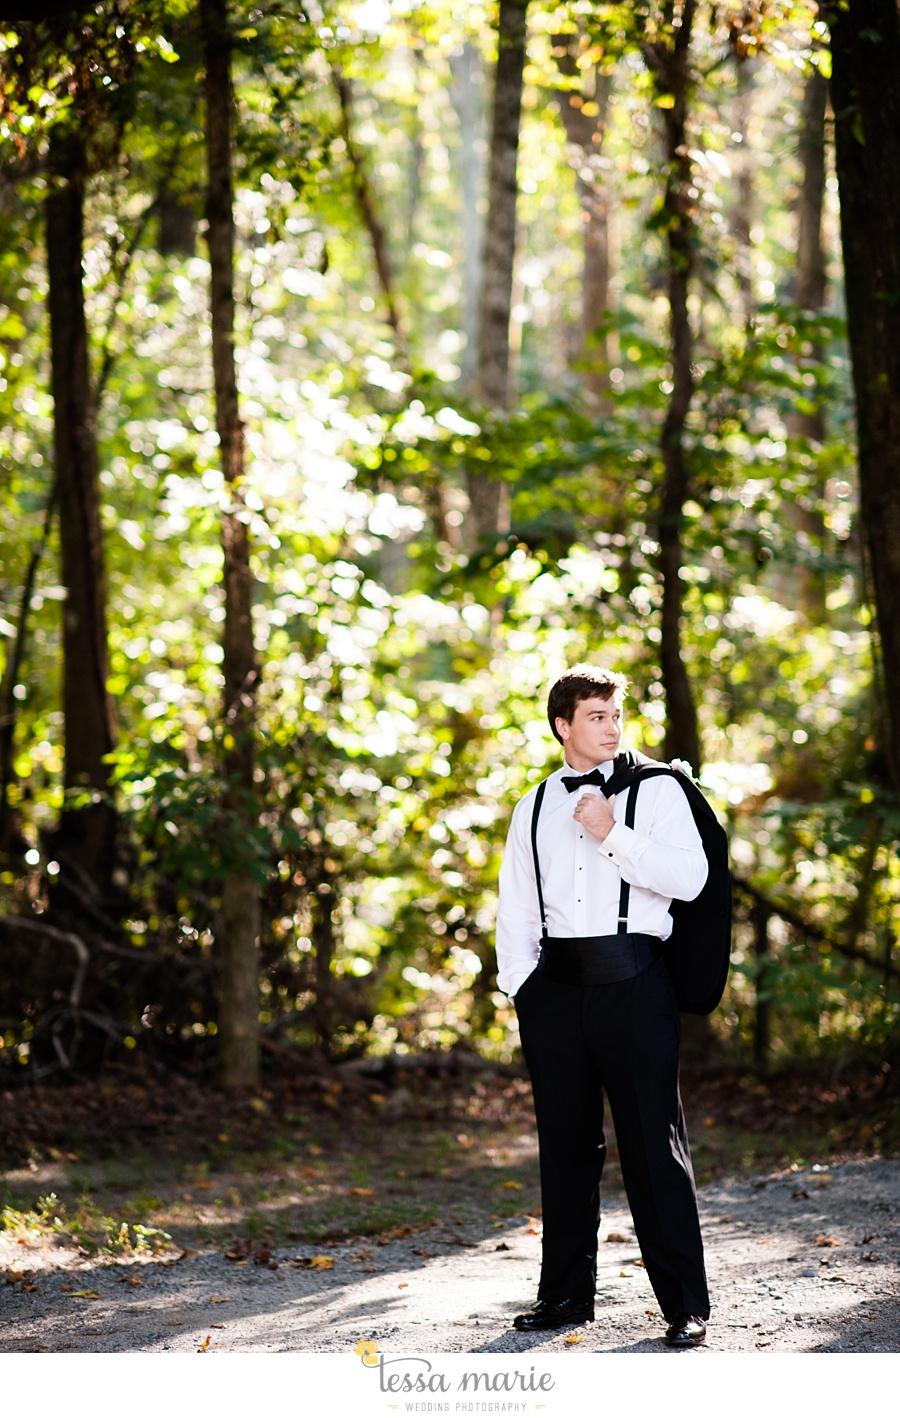 outdoor_wedding_pictures_marietta_sweethearts_candid_emotional_tessa_marie_weddings_0124